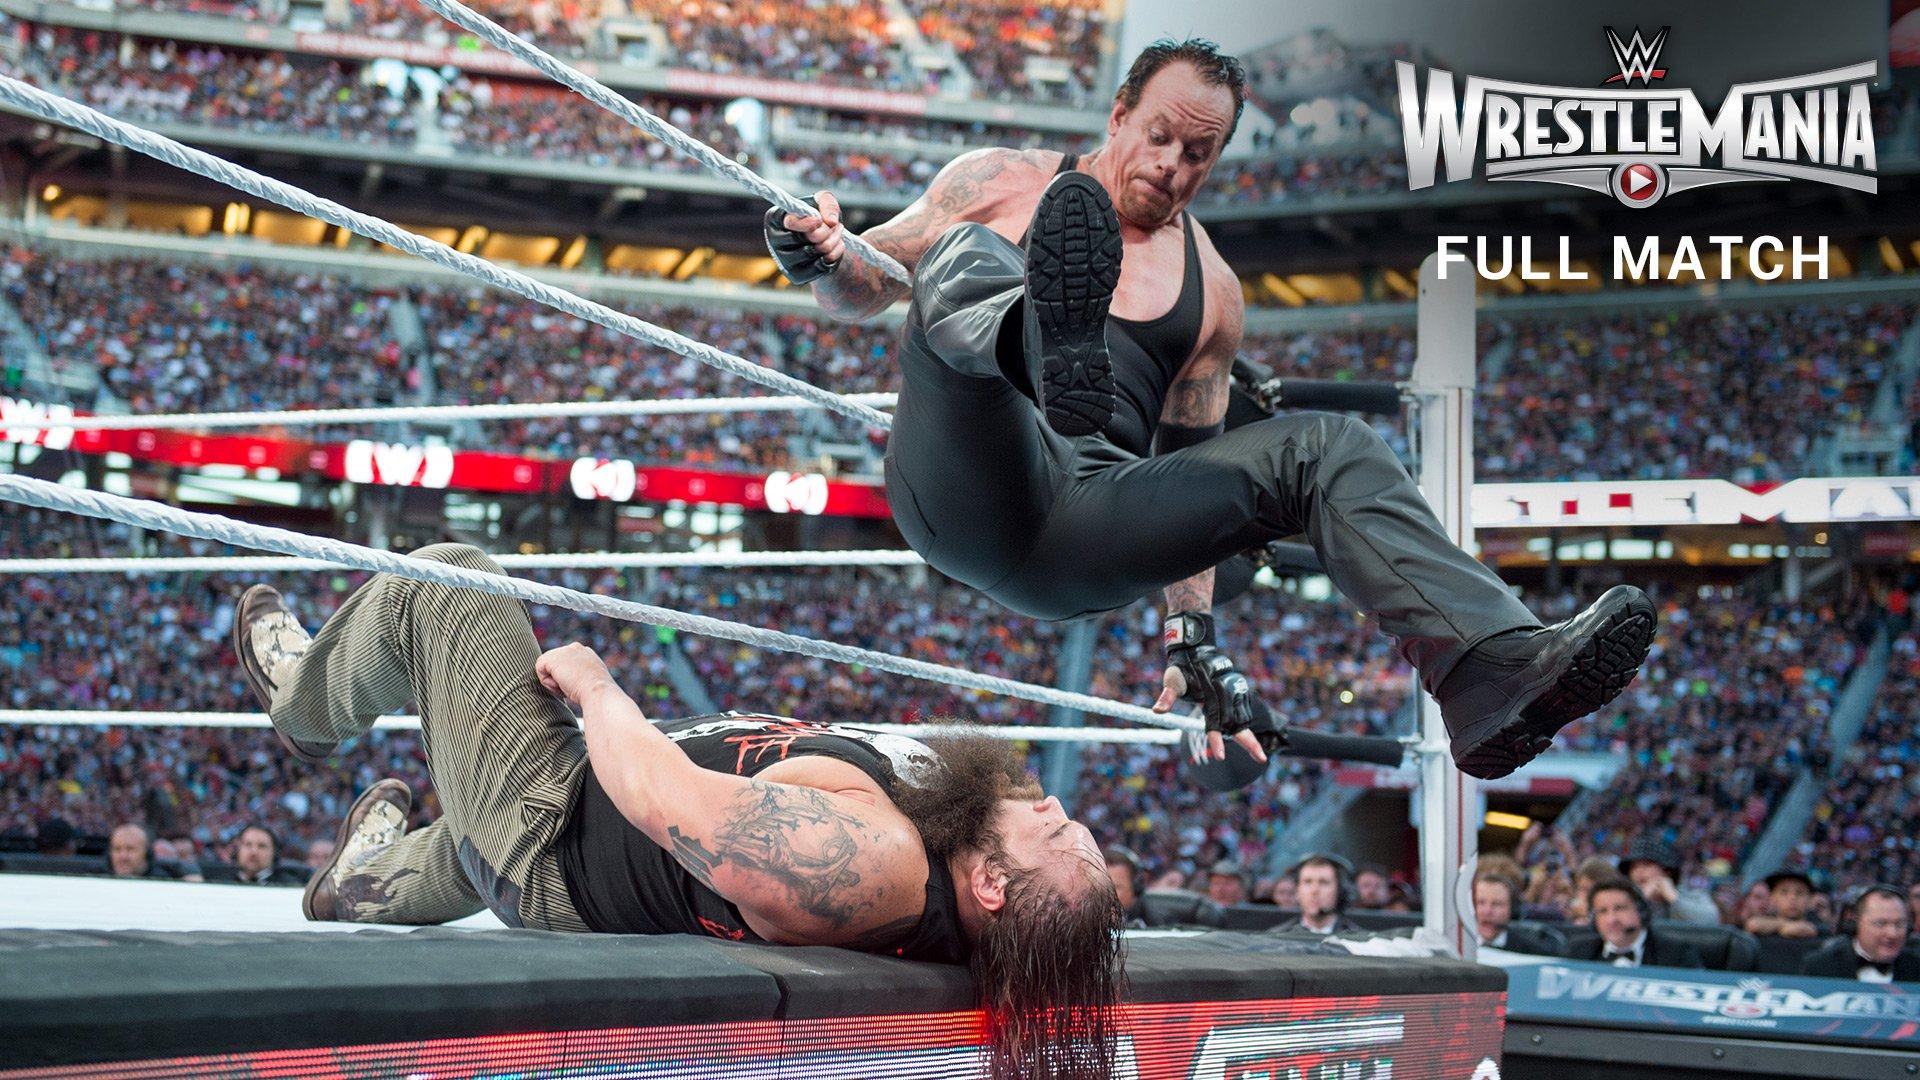 download wrestlemania 31 full show 720p